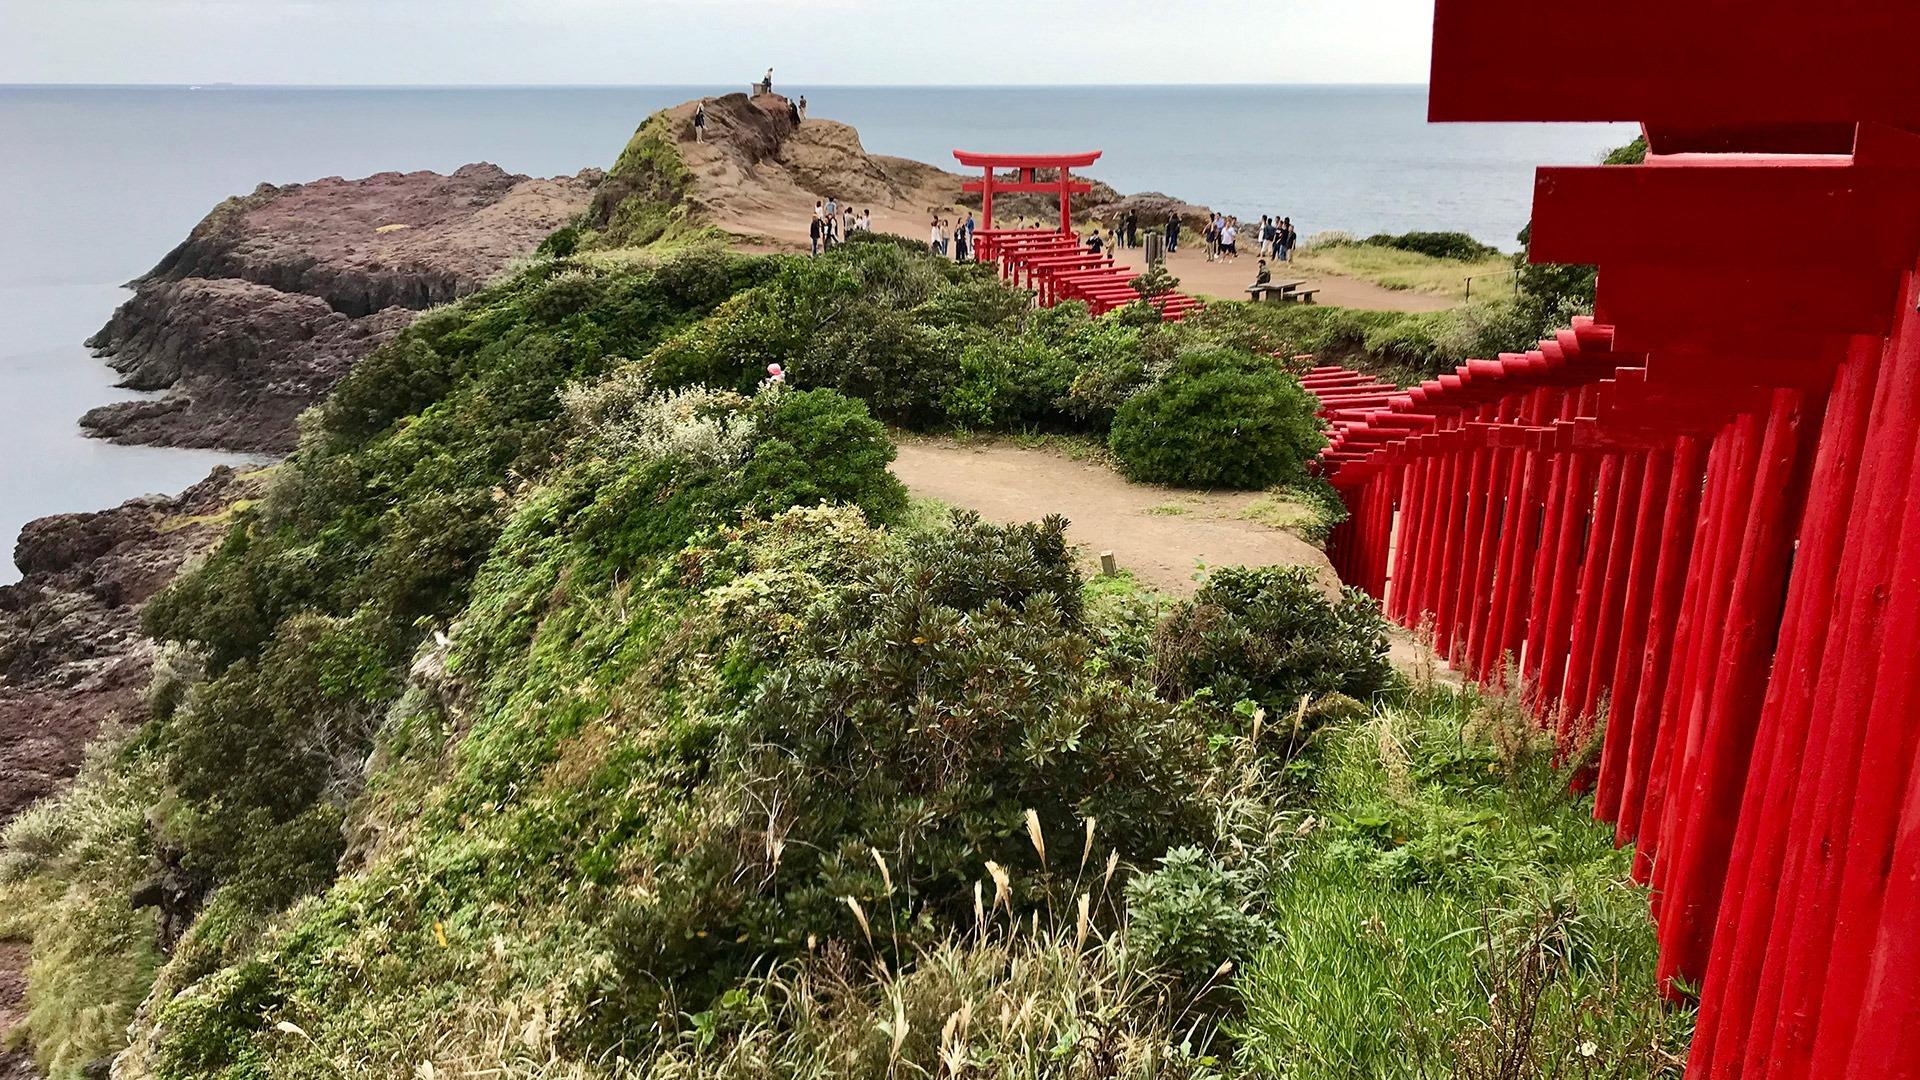 Red torii gates of Motonosumi Shrine in Nagato, Japan